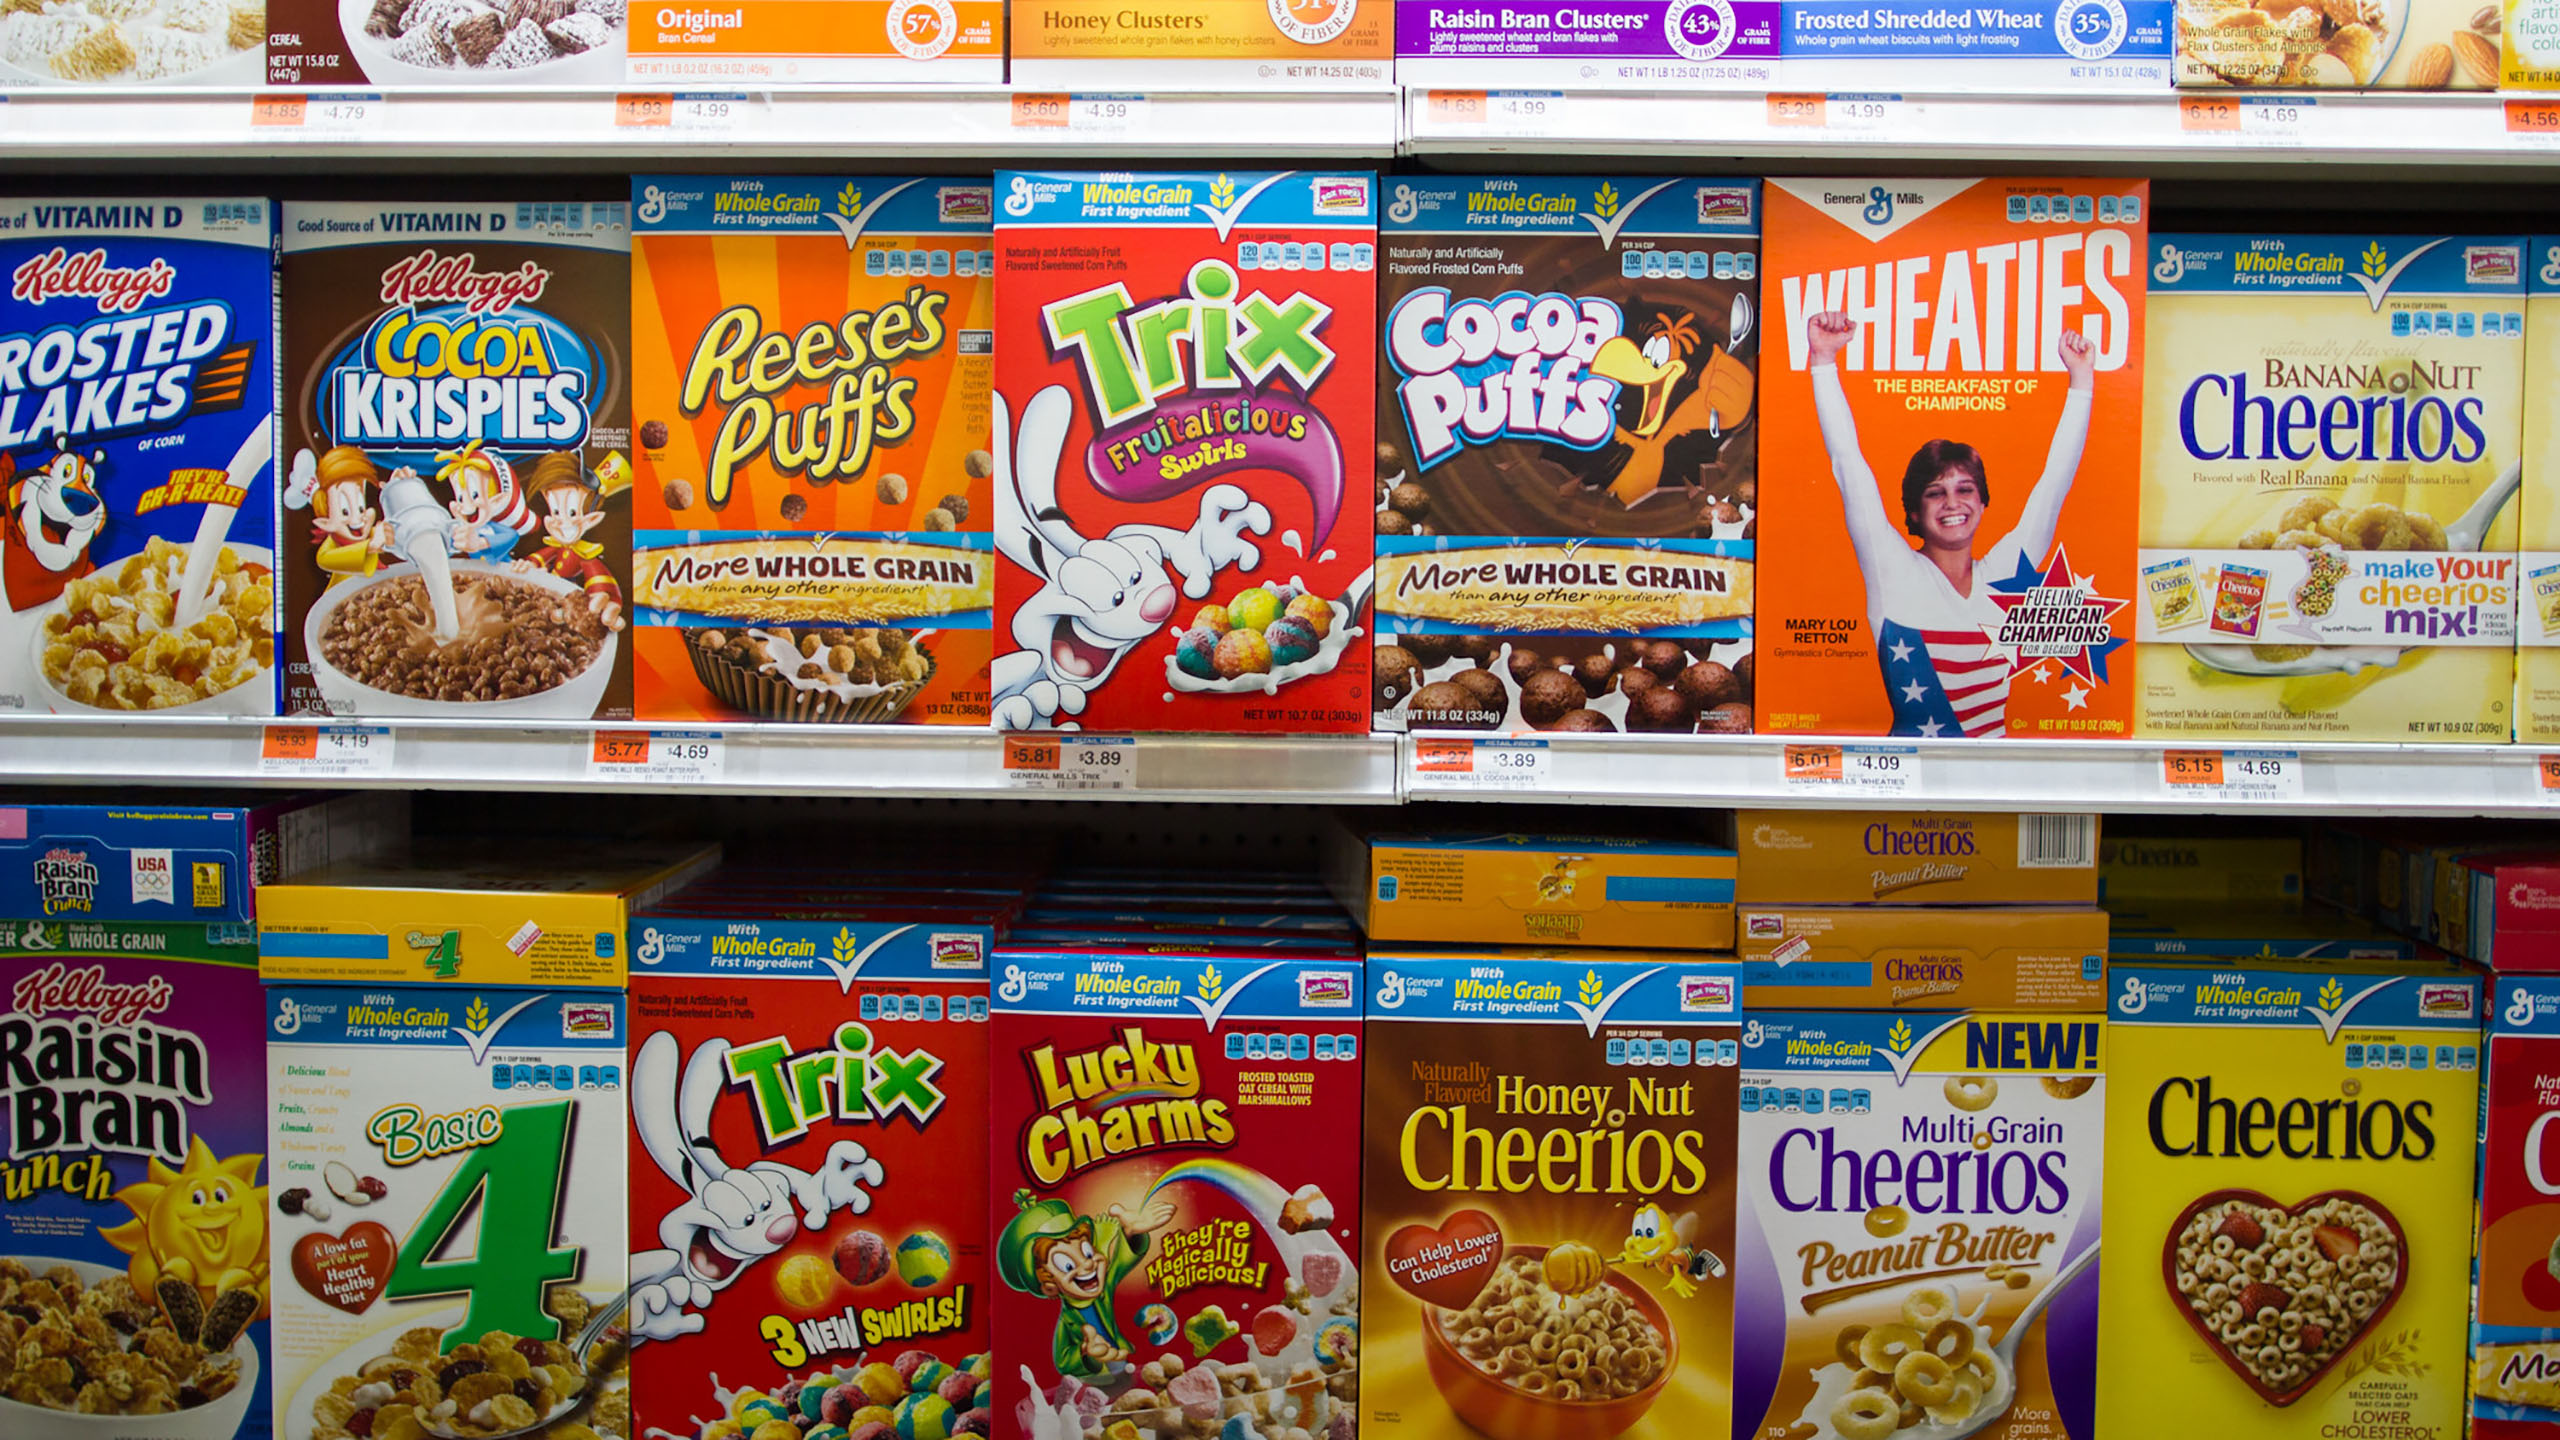 caja de cereal, personajes infantiles, cereal